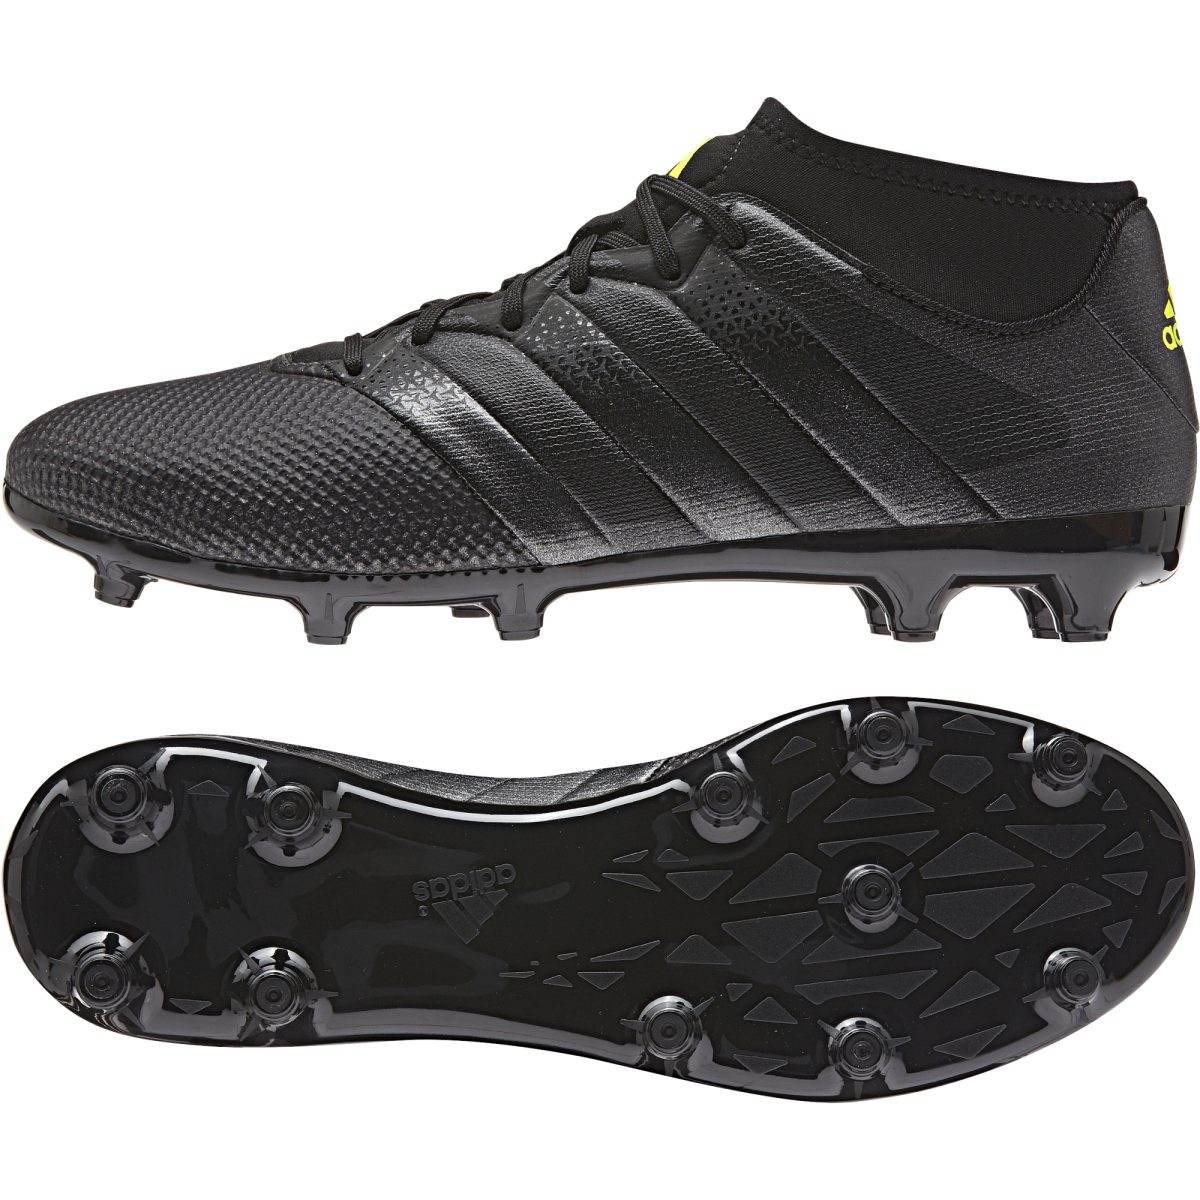 competitive price 65ad3 3f76d adidas ace 16.3 primemesh fg ag fotbollssko senior fotbollsskor